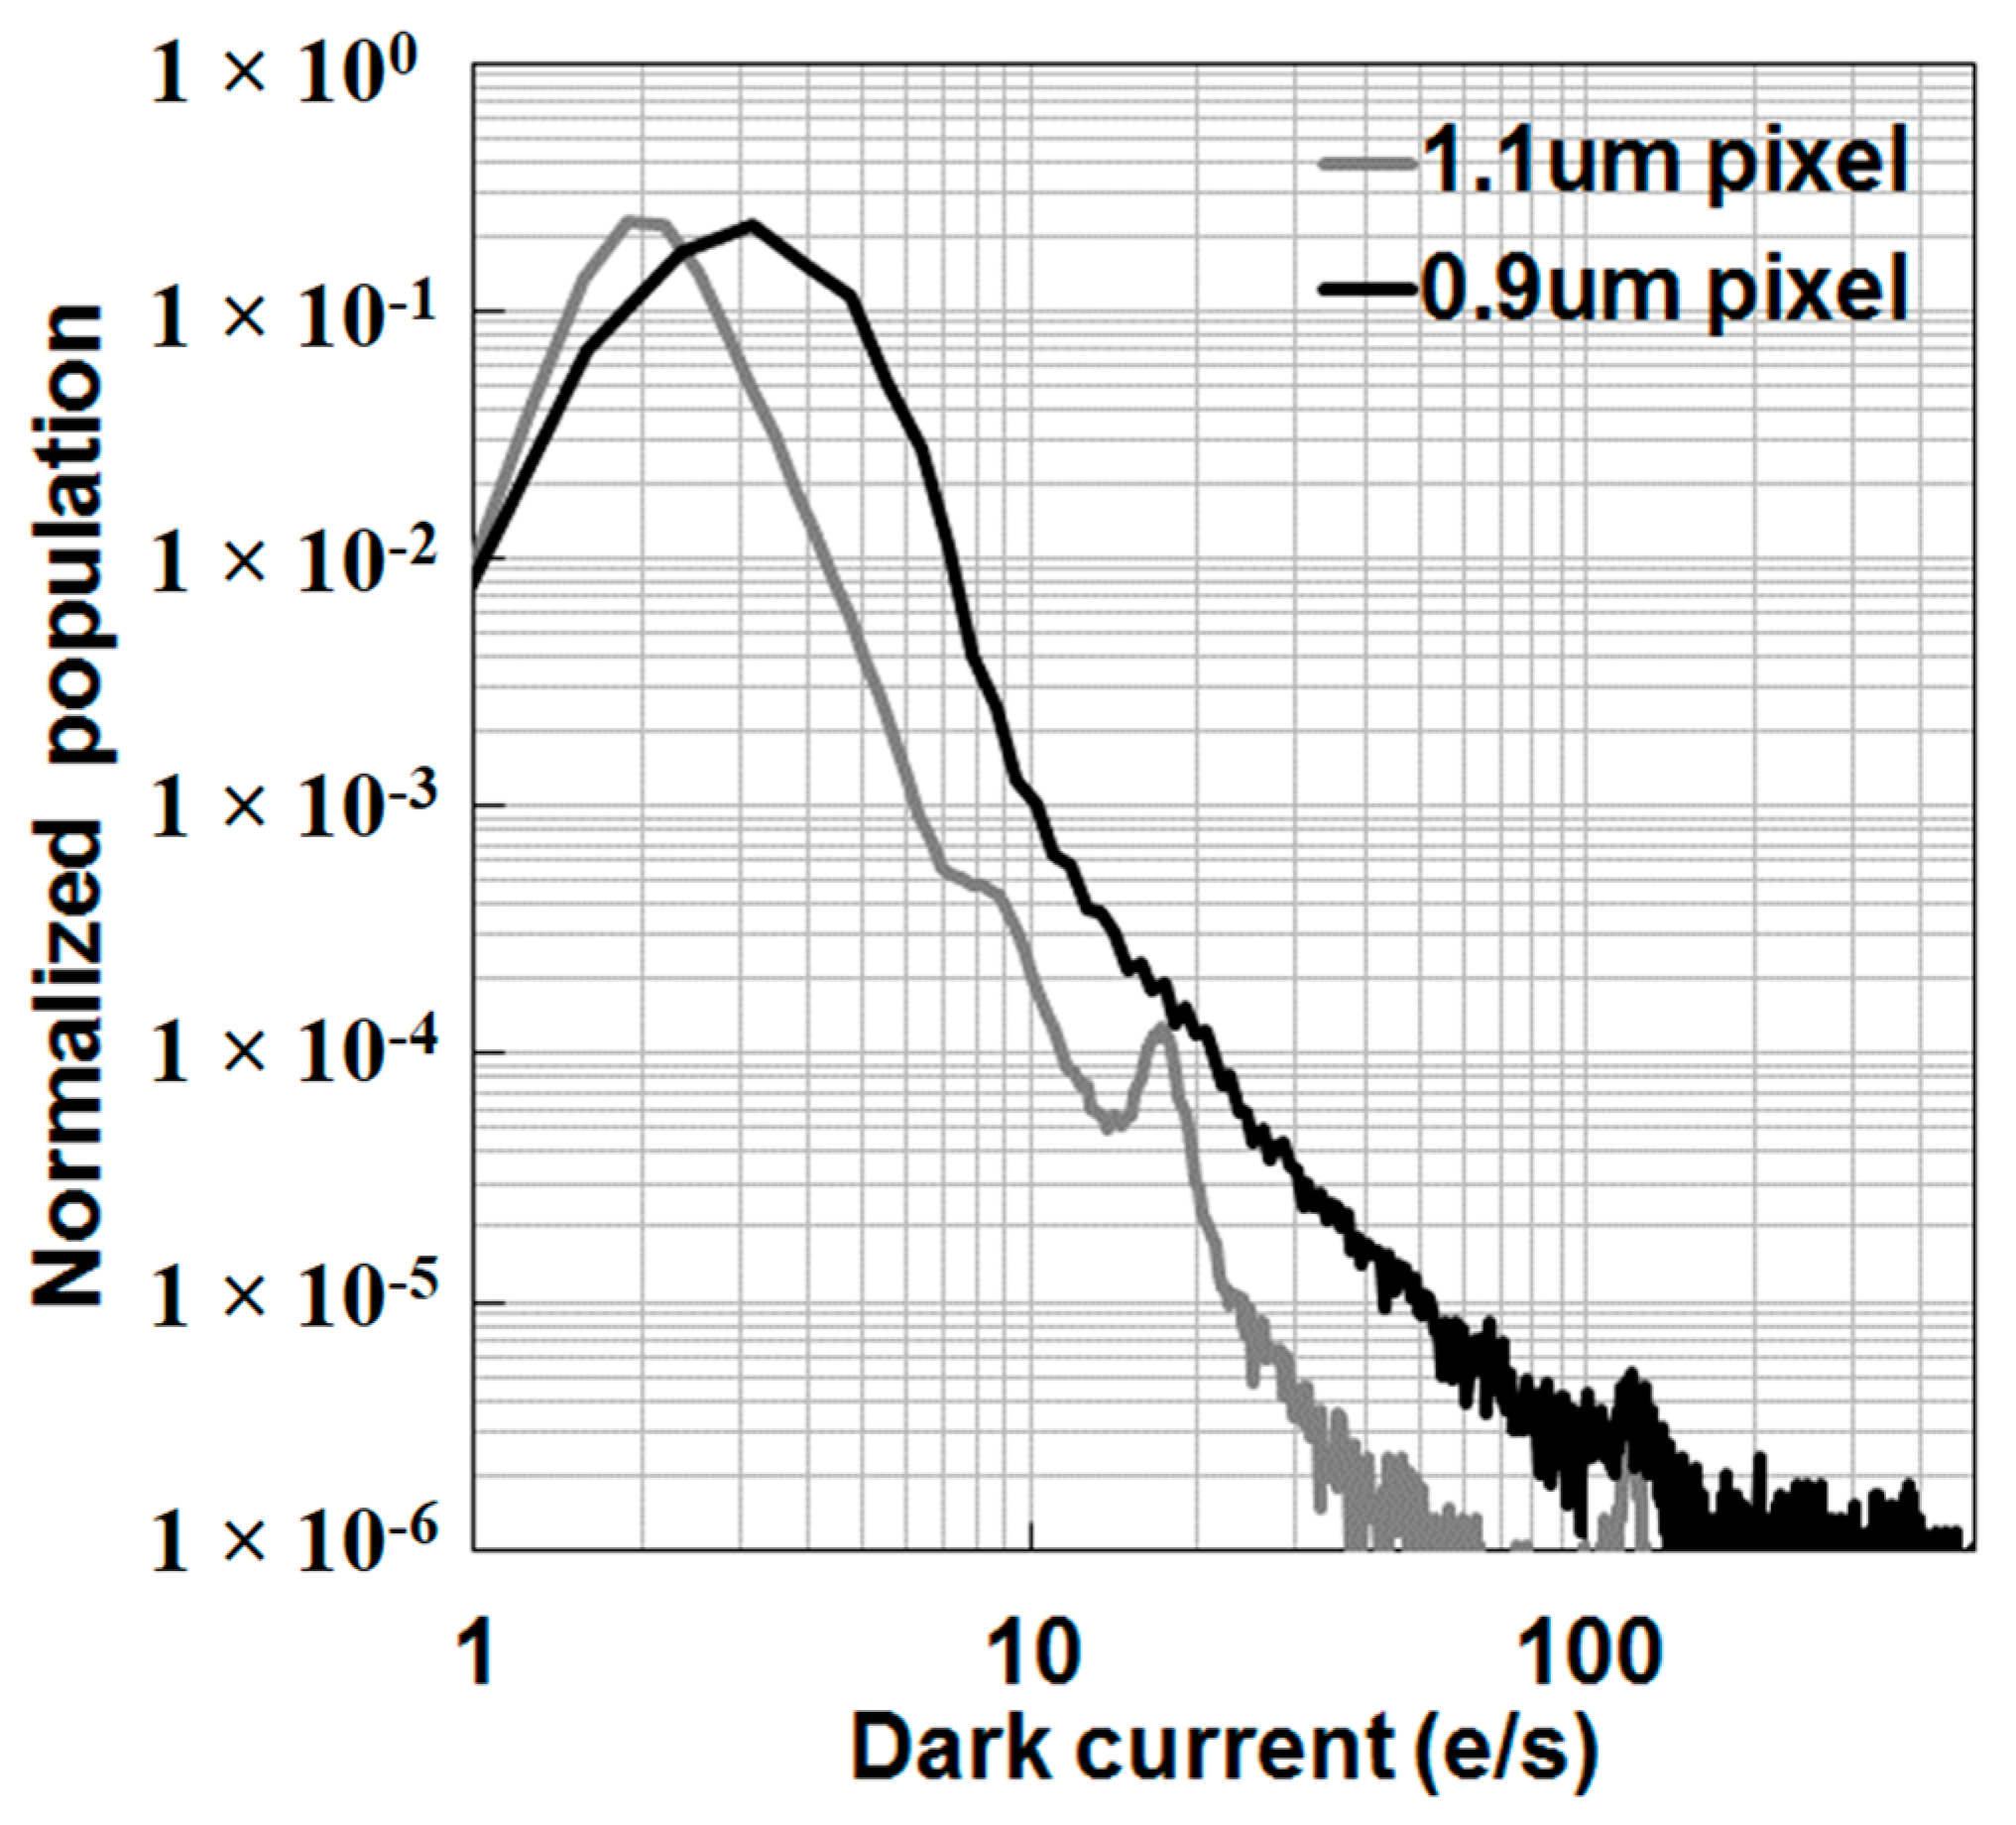 Sensors Free Full Text A 45 Nm Stacked Cmos Image Sensor Process 8 Megapixel Imaging No